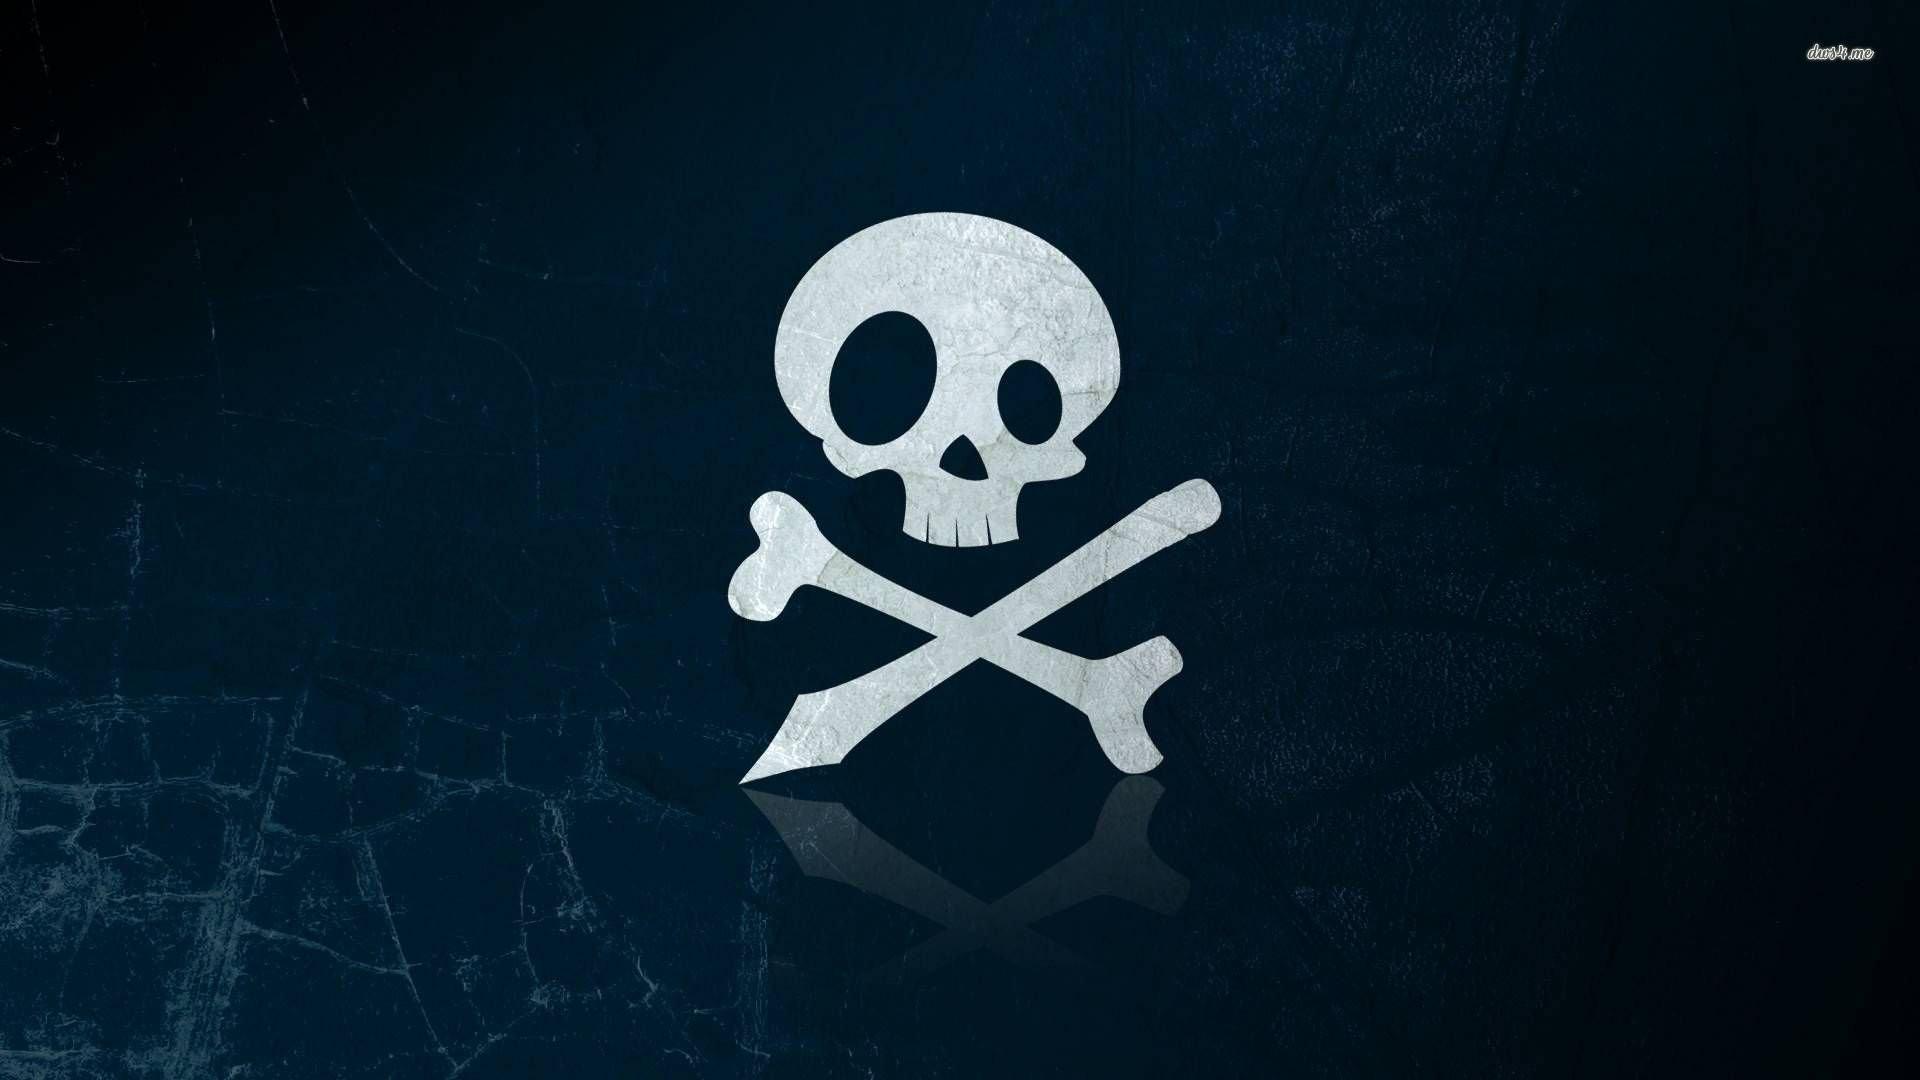 Skull And Bones 2018 Video Game 4k Hd Desktop Wallpaper: Blue Skulls Wallpaper (48+ Images